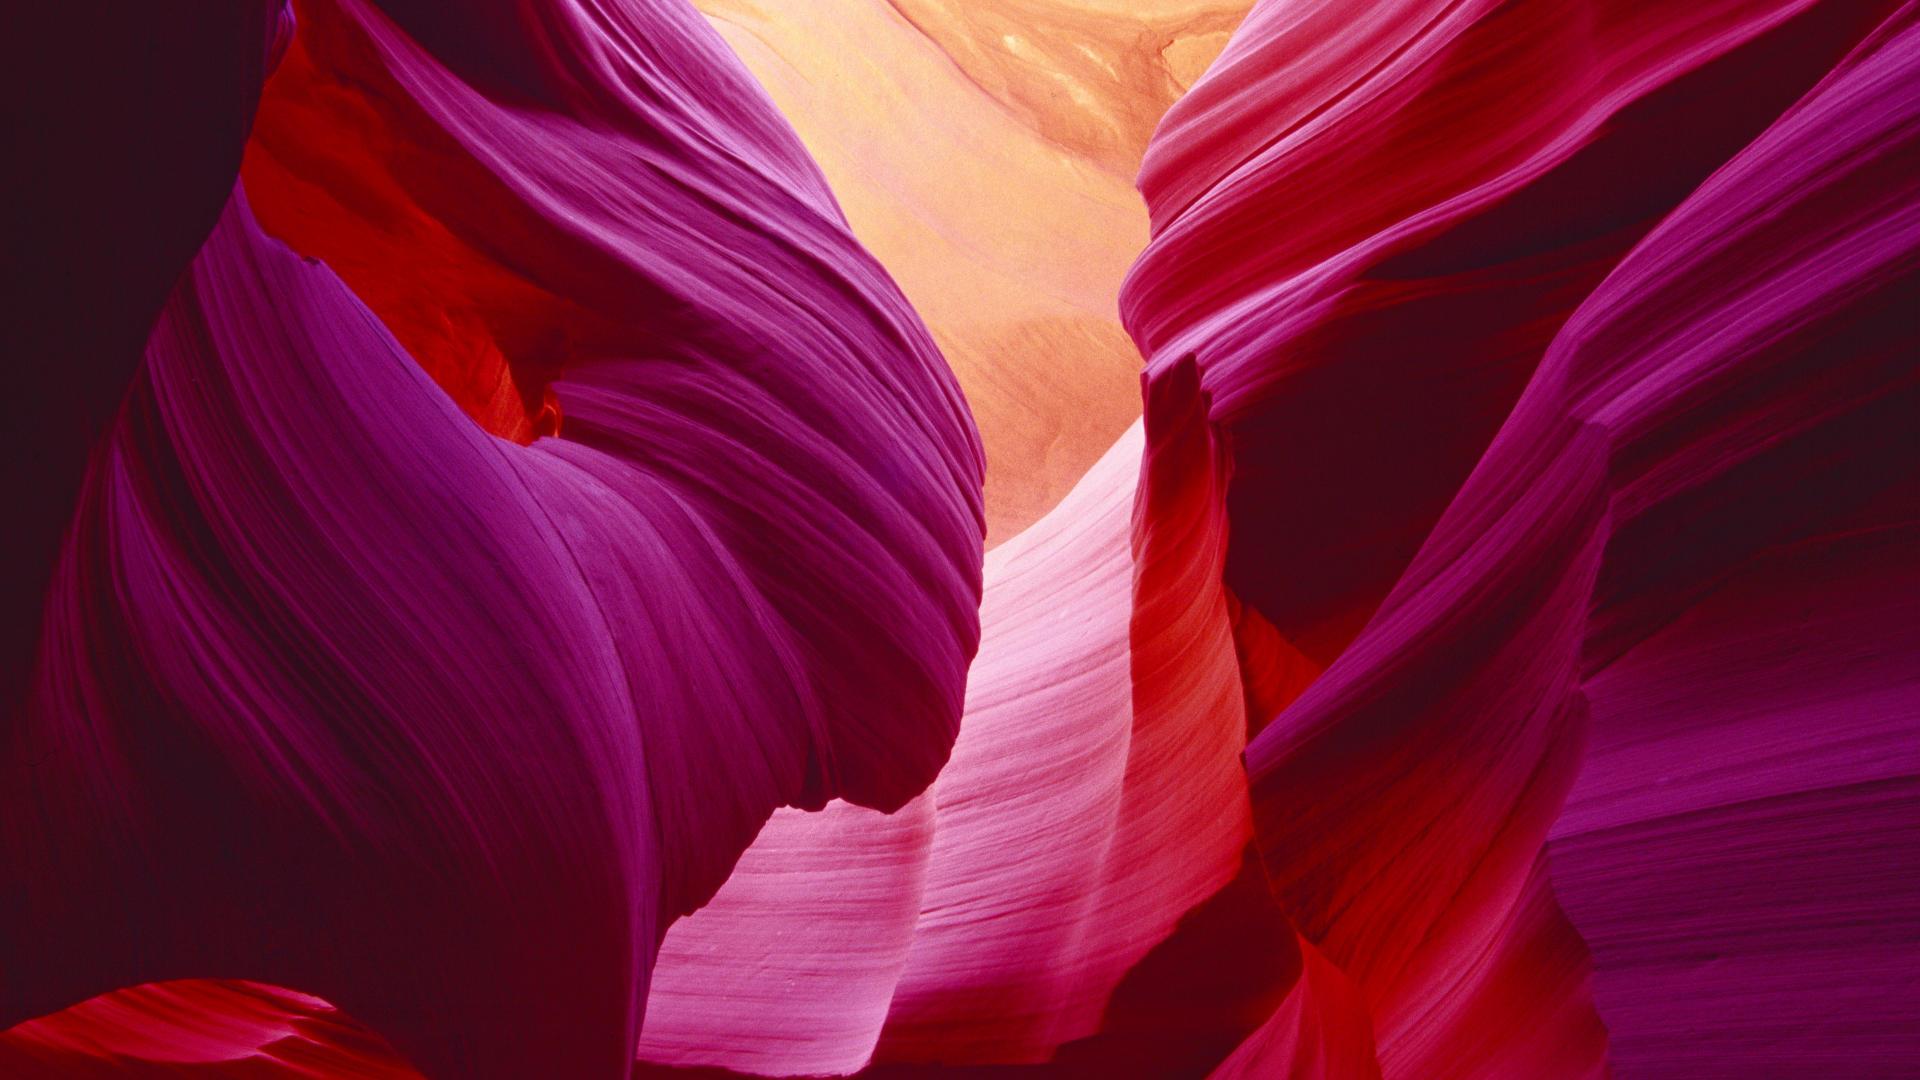 canyon images desktop